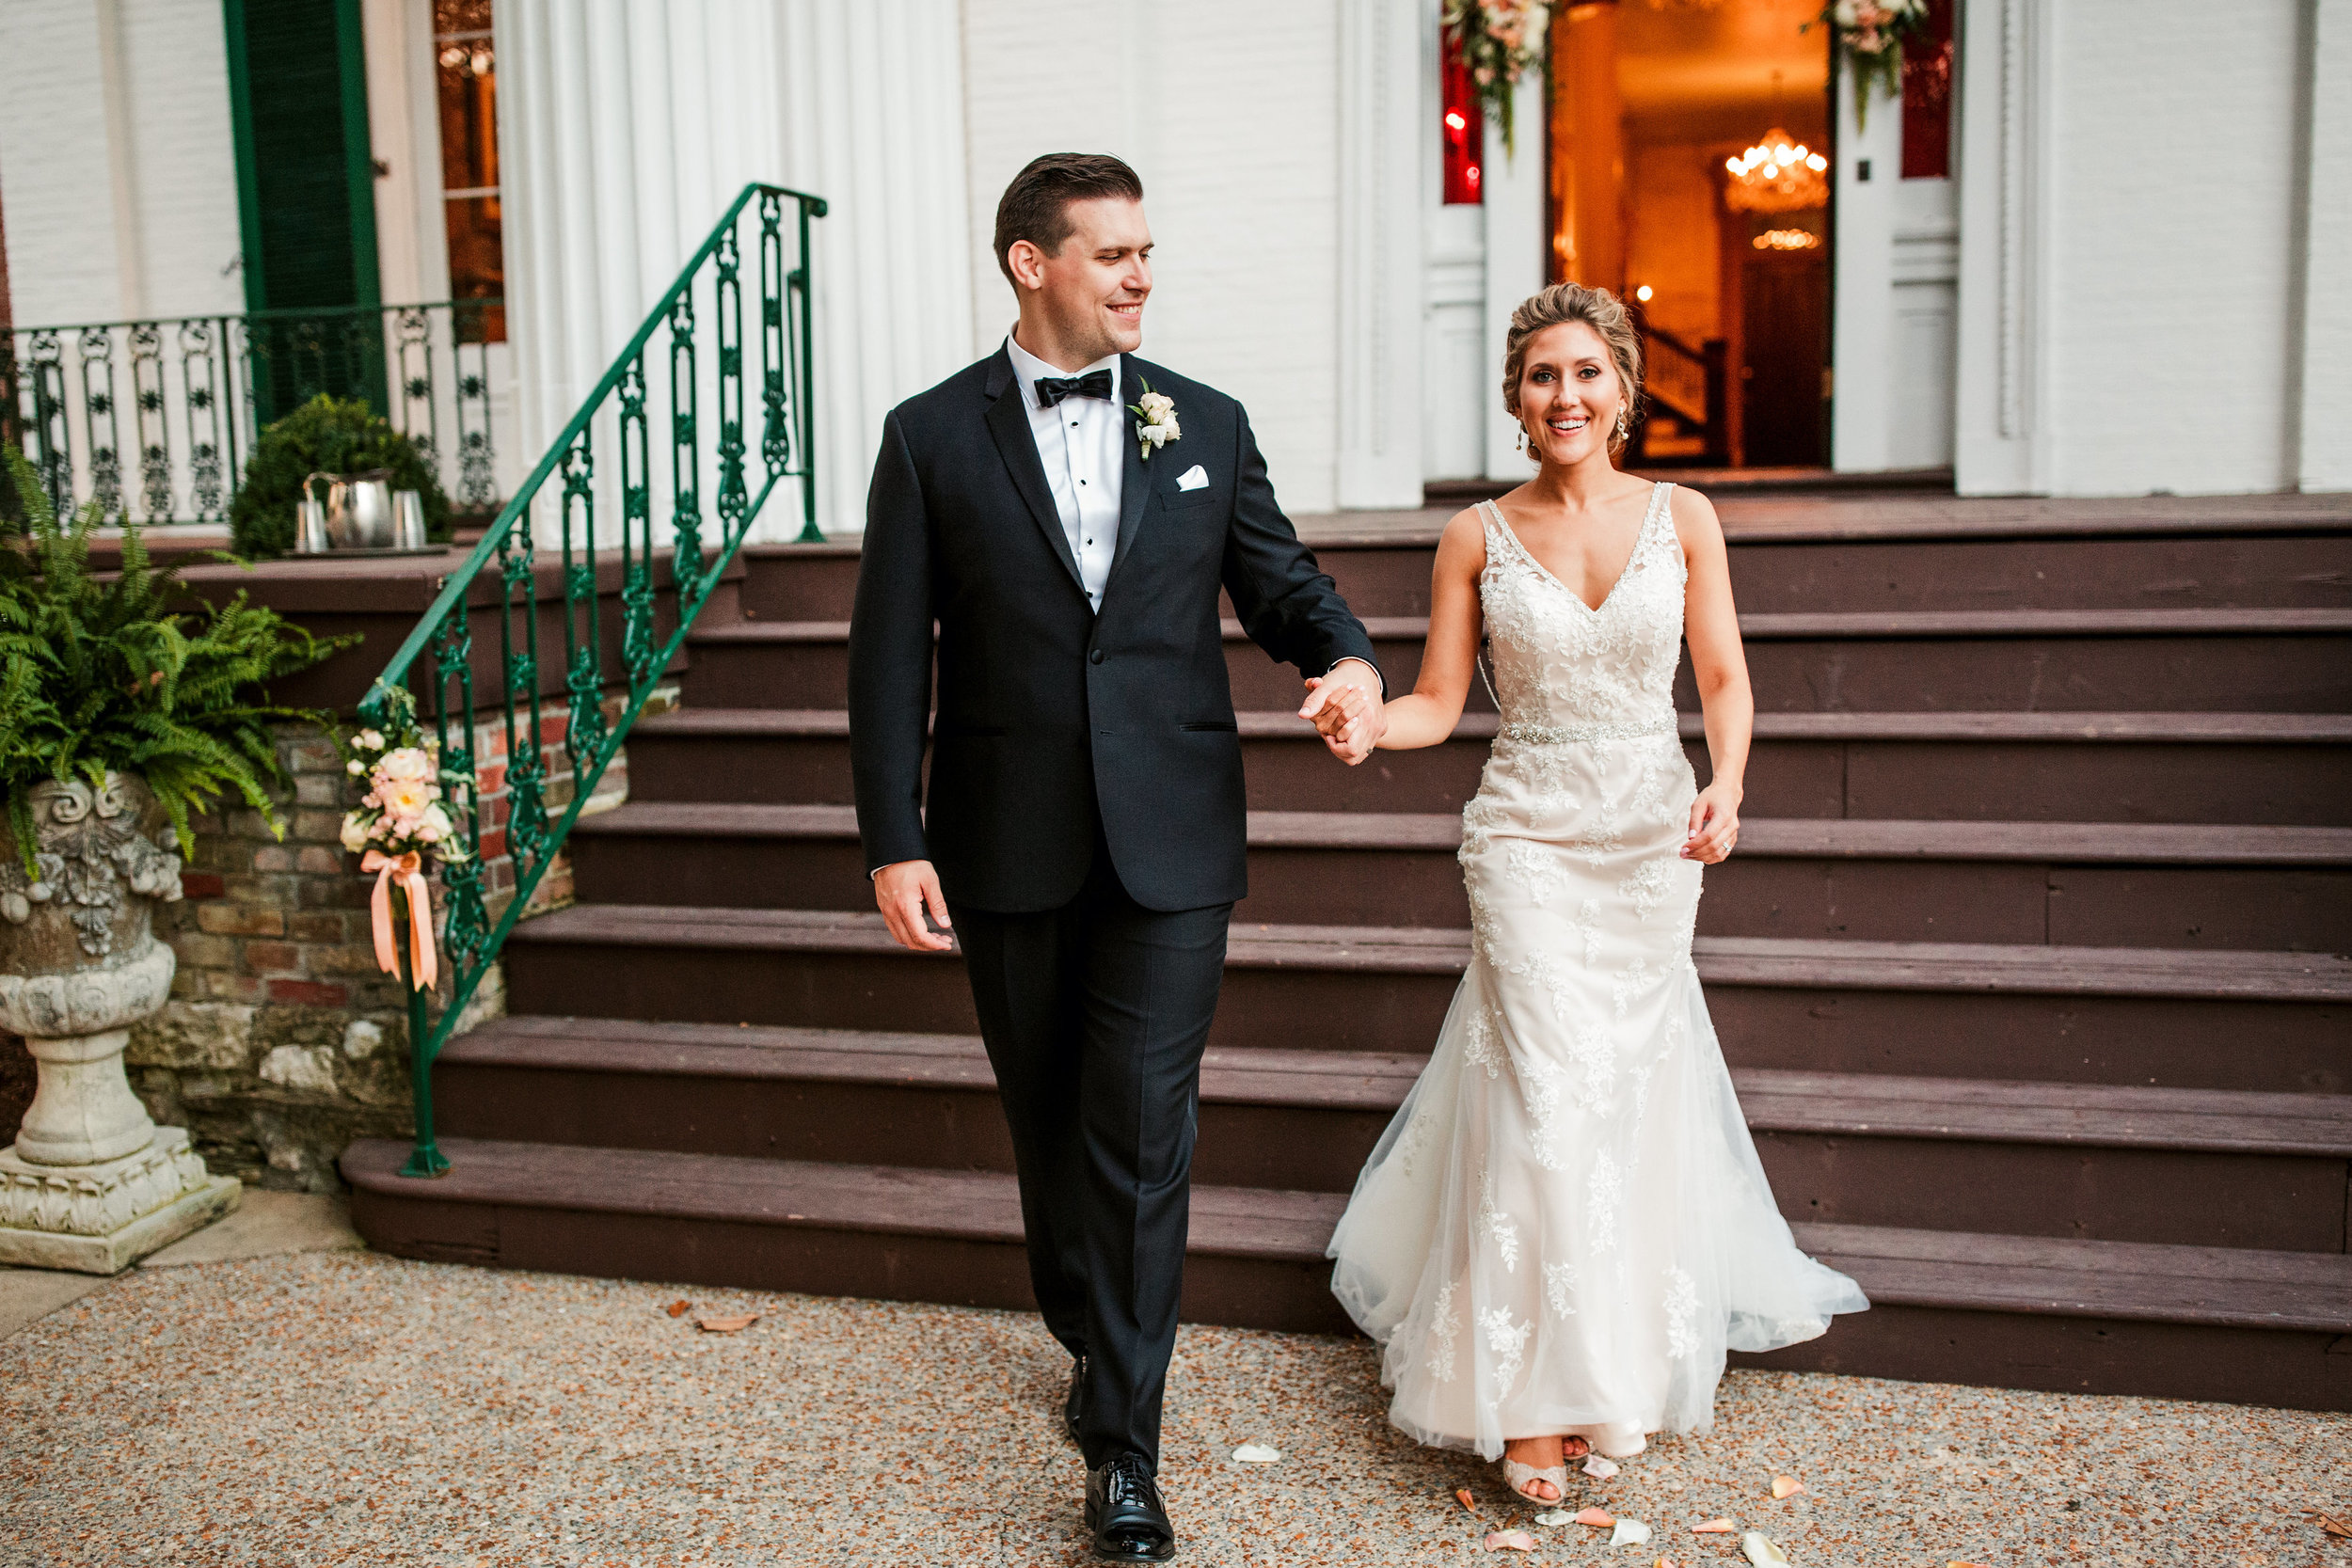 Riverwood-Mansion-Wedding27.jpg